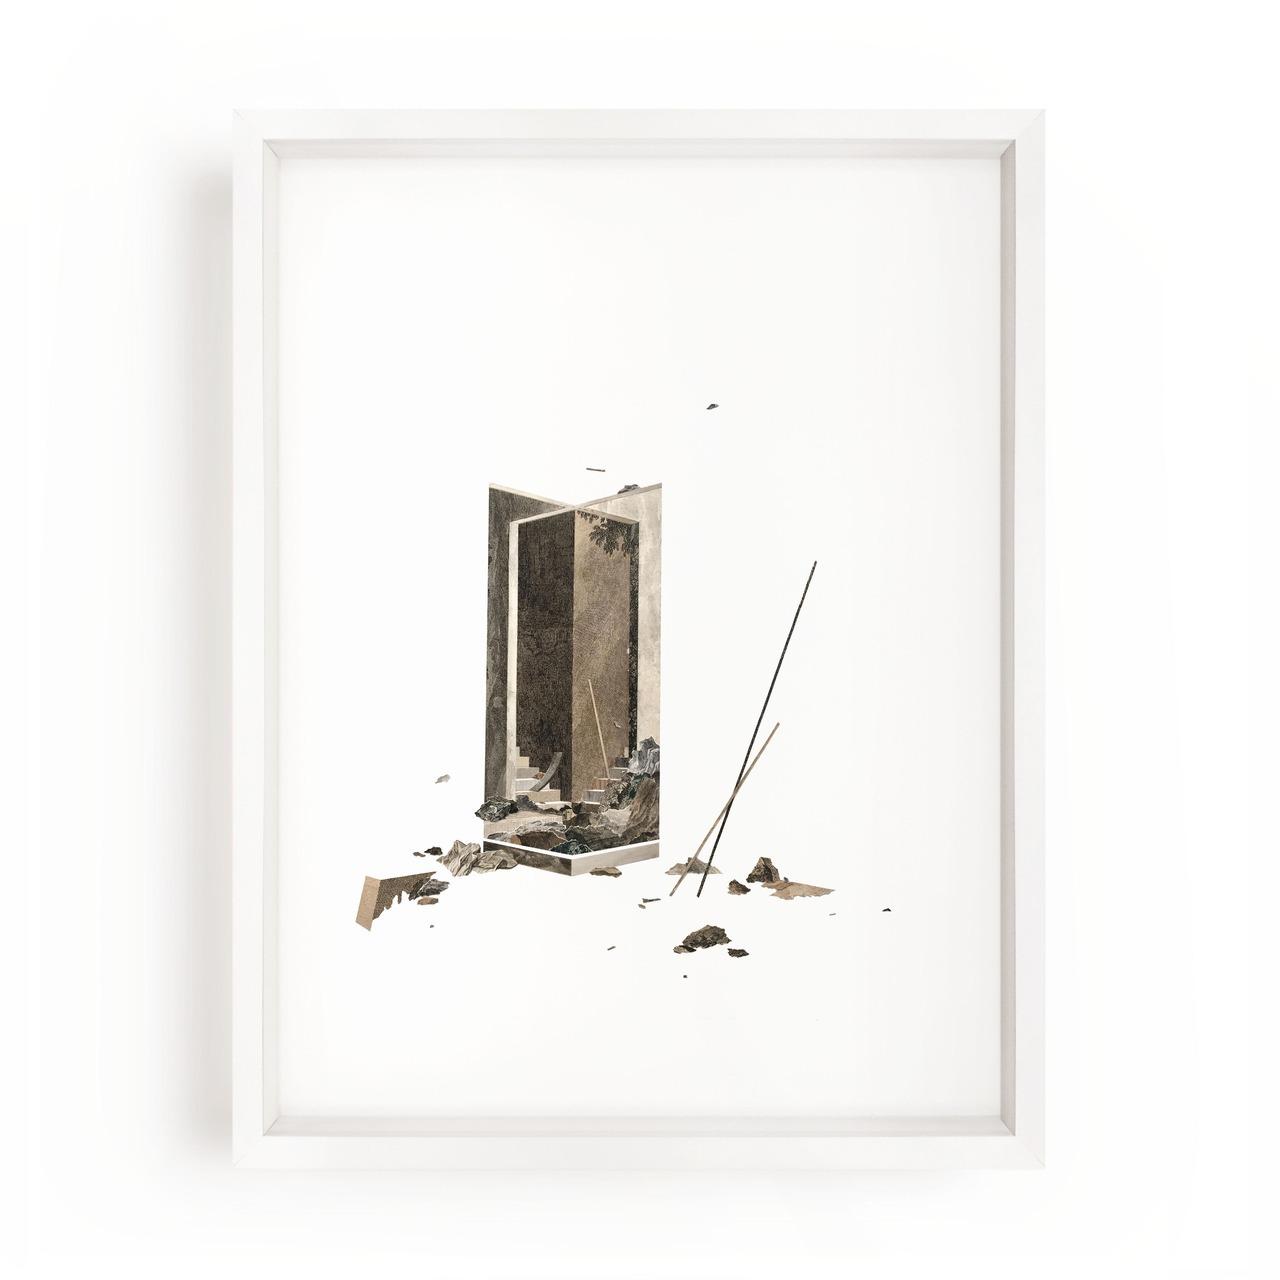 Claire Trotignon   Infini de taille moyenne  Collage of engraving 30 x 40 cm - 2018 - Private collection